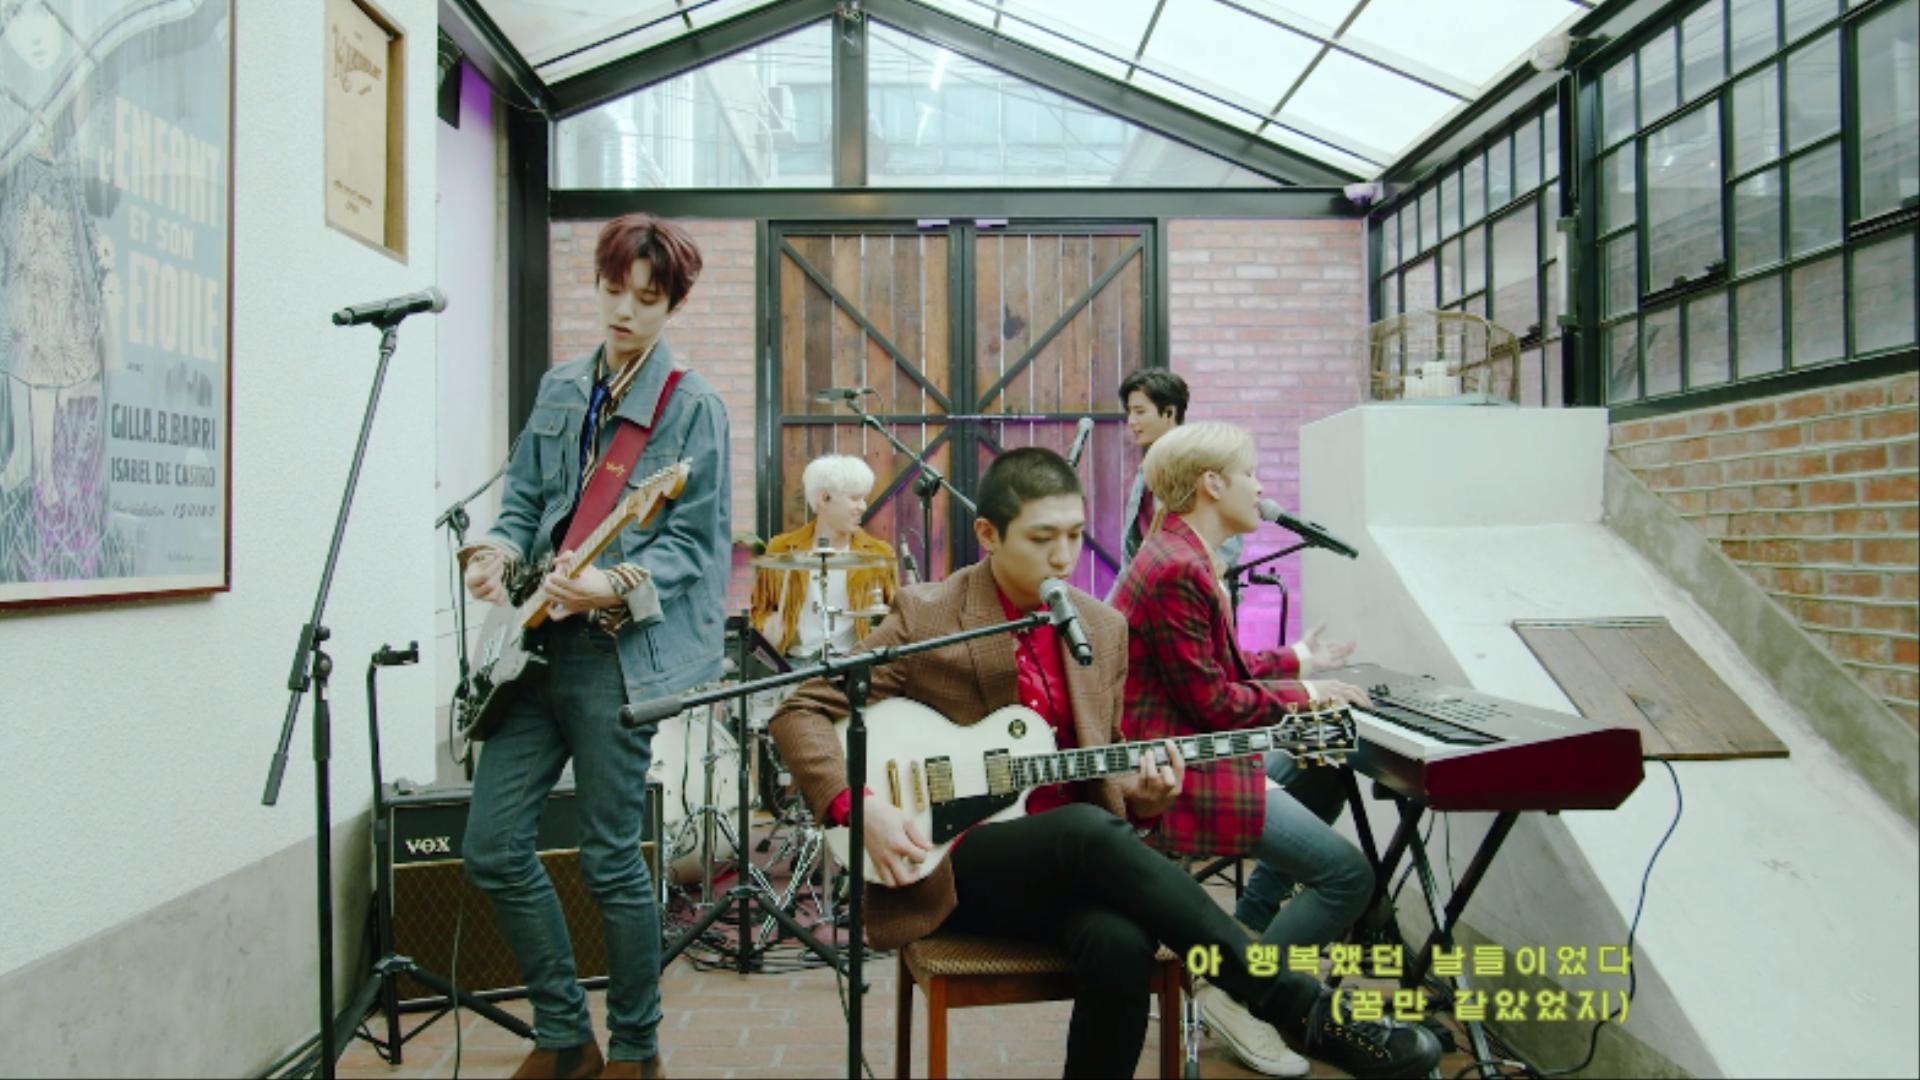 "DAY6(데이식스) ""행복했던 날들이었다"" Live Video (12PM Ver.)"